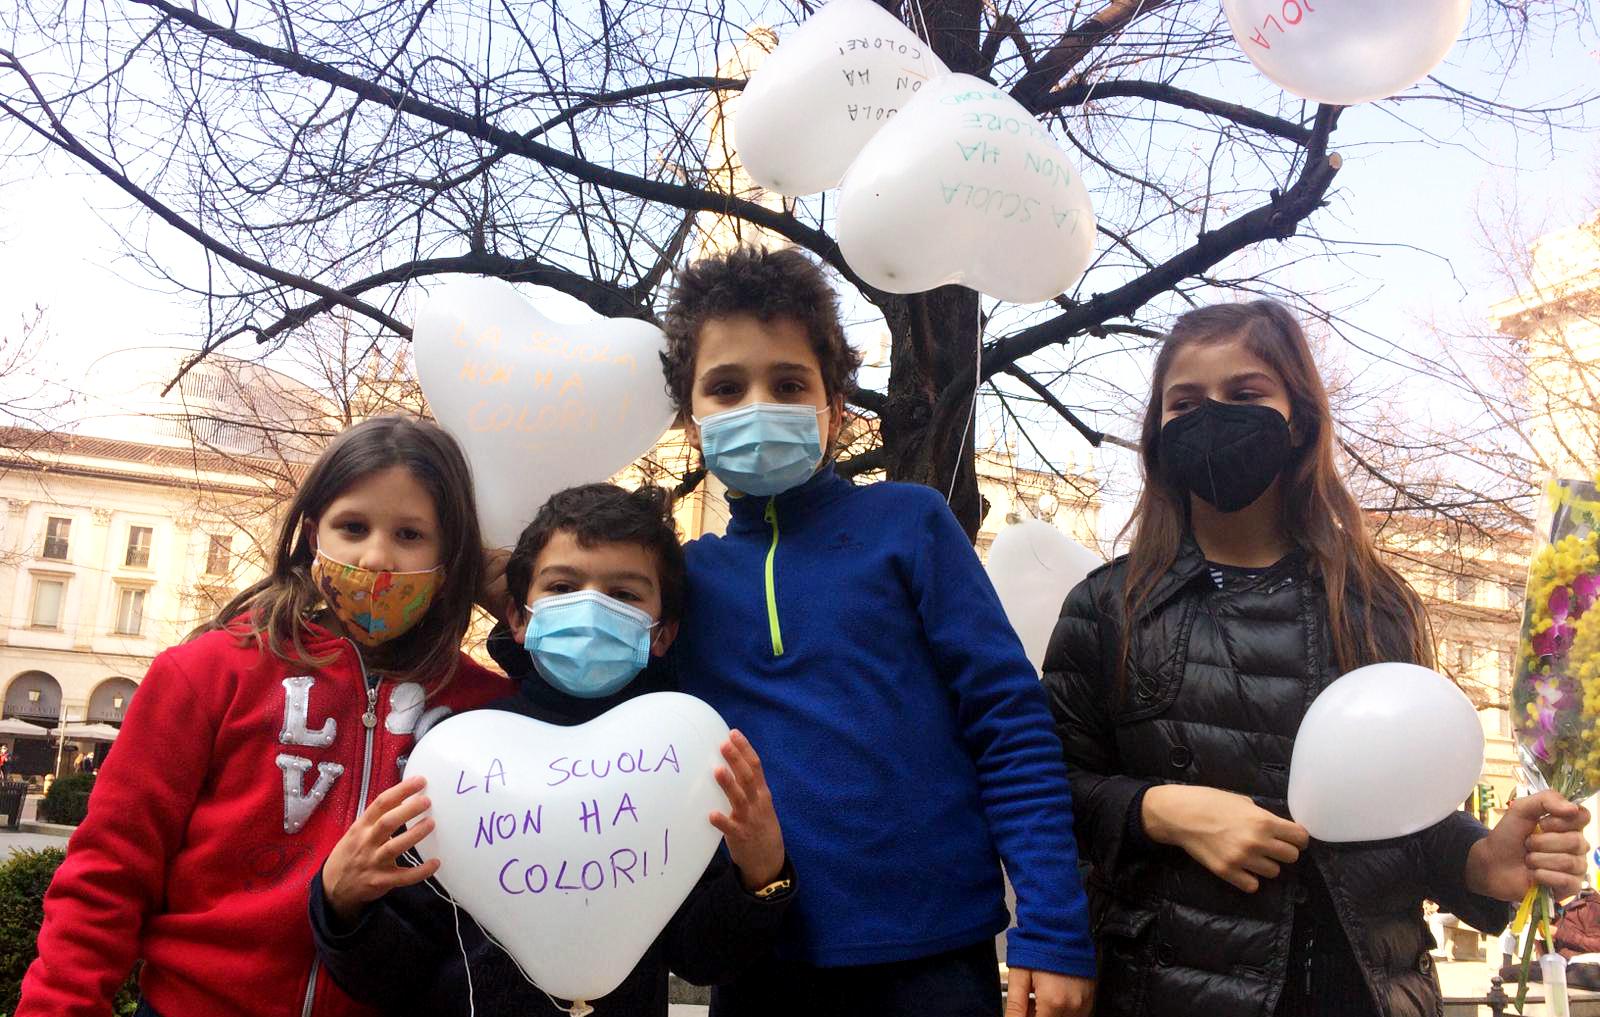 8 Marzo bambini con palloncini bianchi a Palazzo Marino